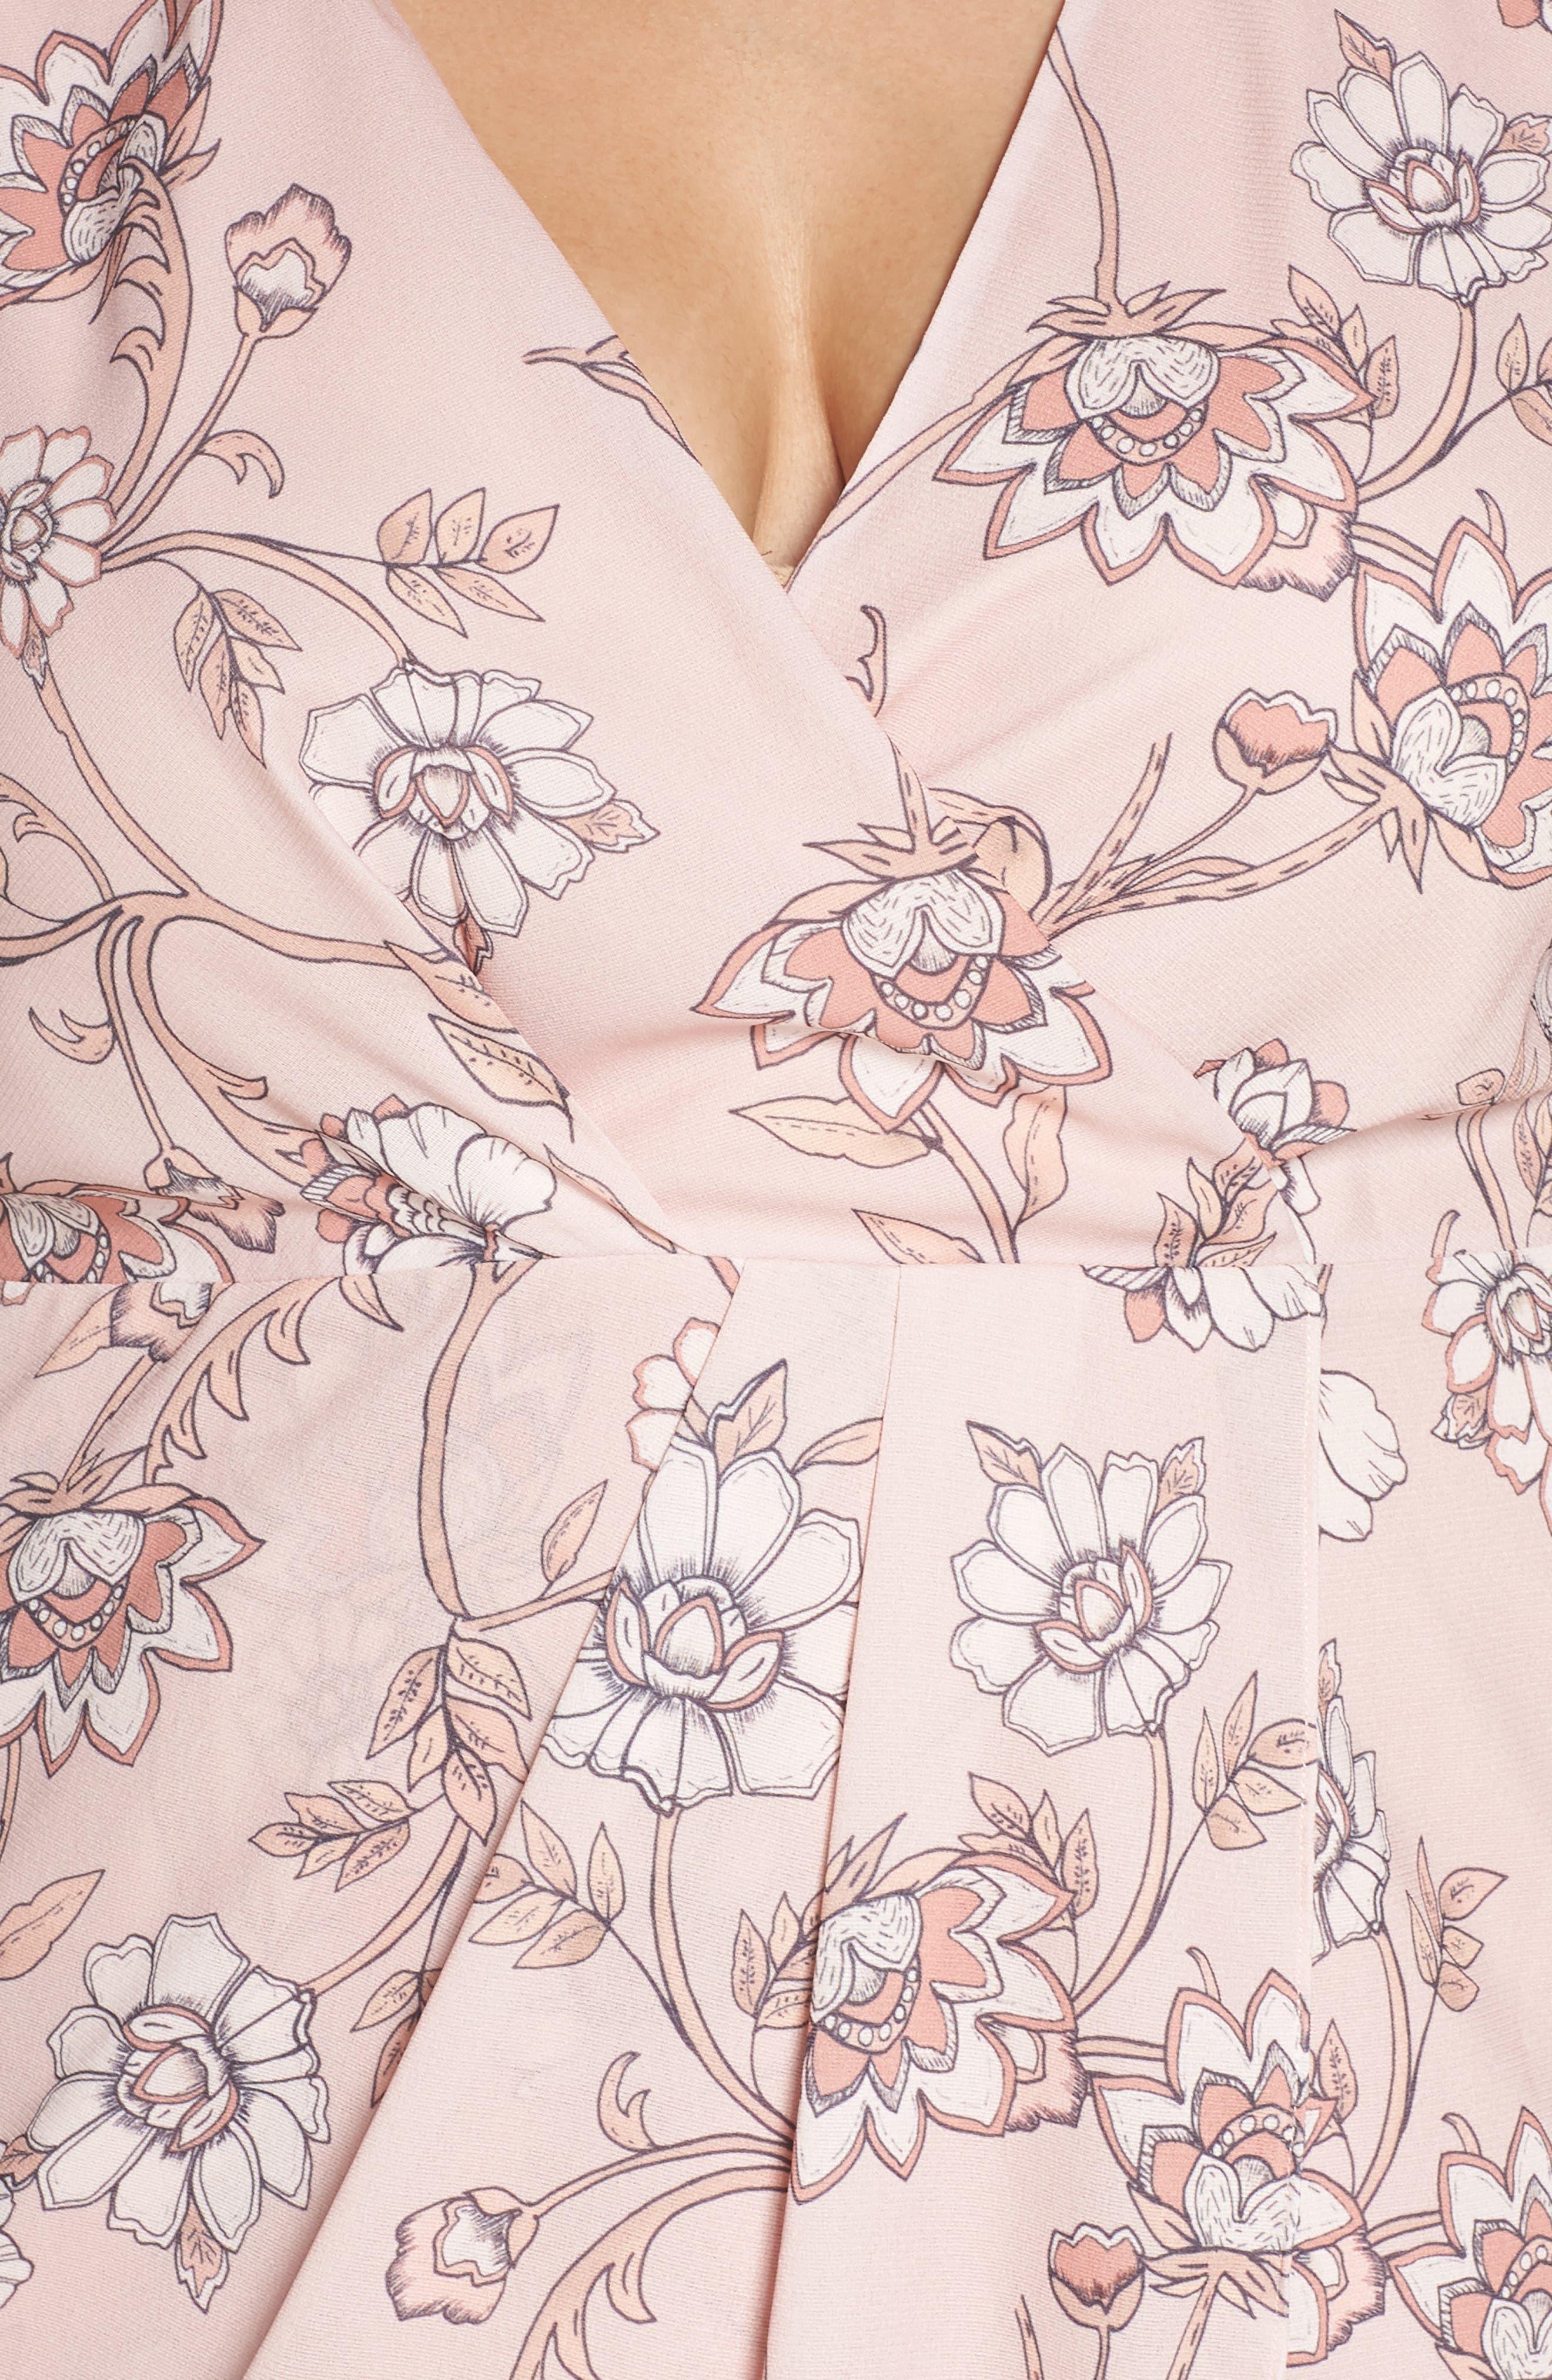 Fiorella Floral Drape Sheath Dress,                             Alternate thumbnail 4, color,                             650